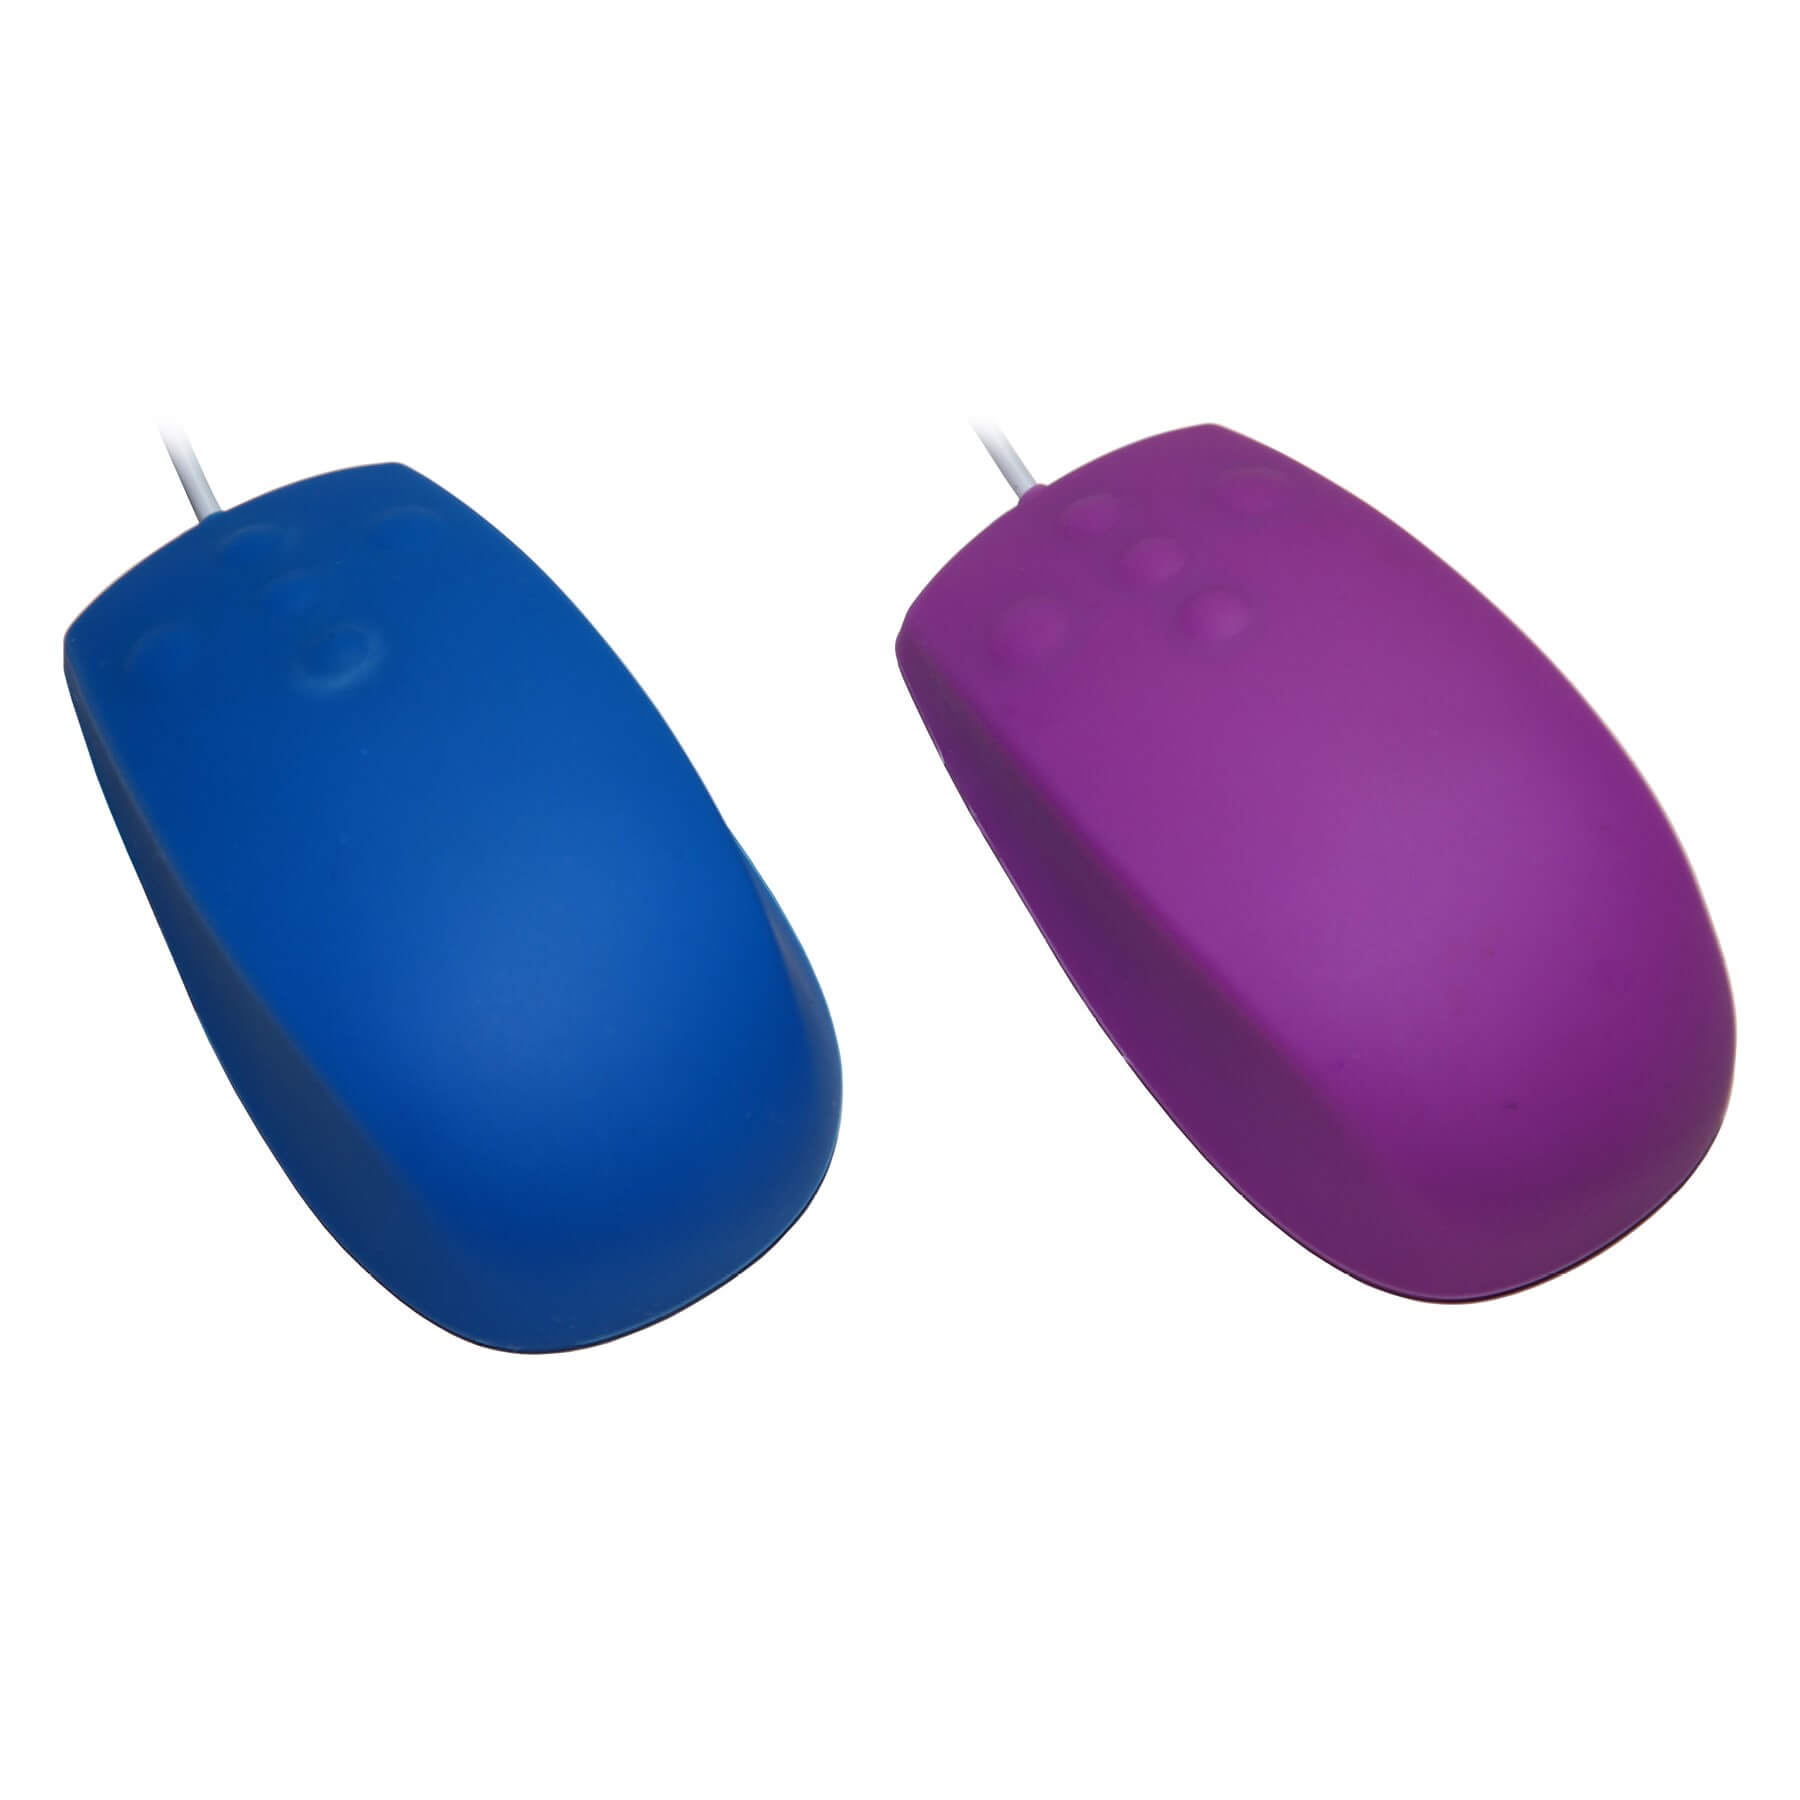 SM502 - silikonová myš, bílá